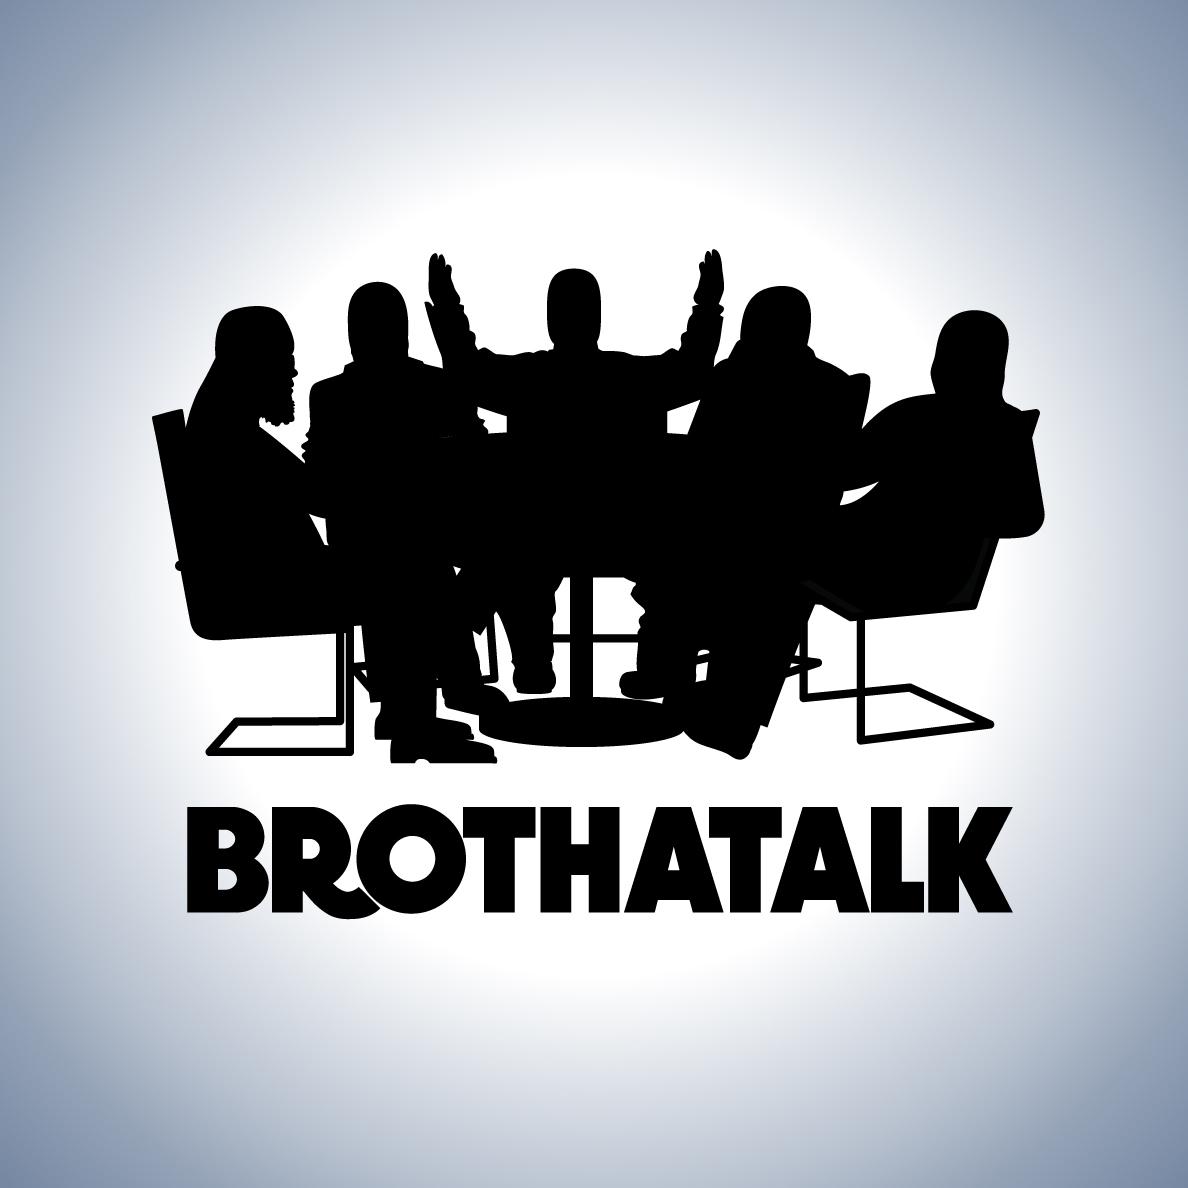 Logo-Brotha-talk-podcast.jpg